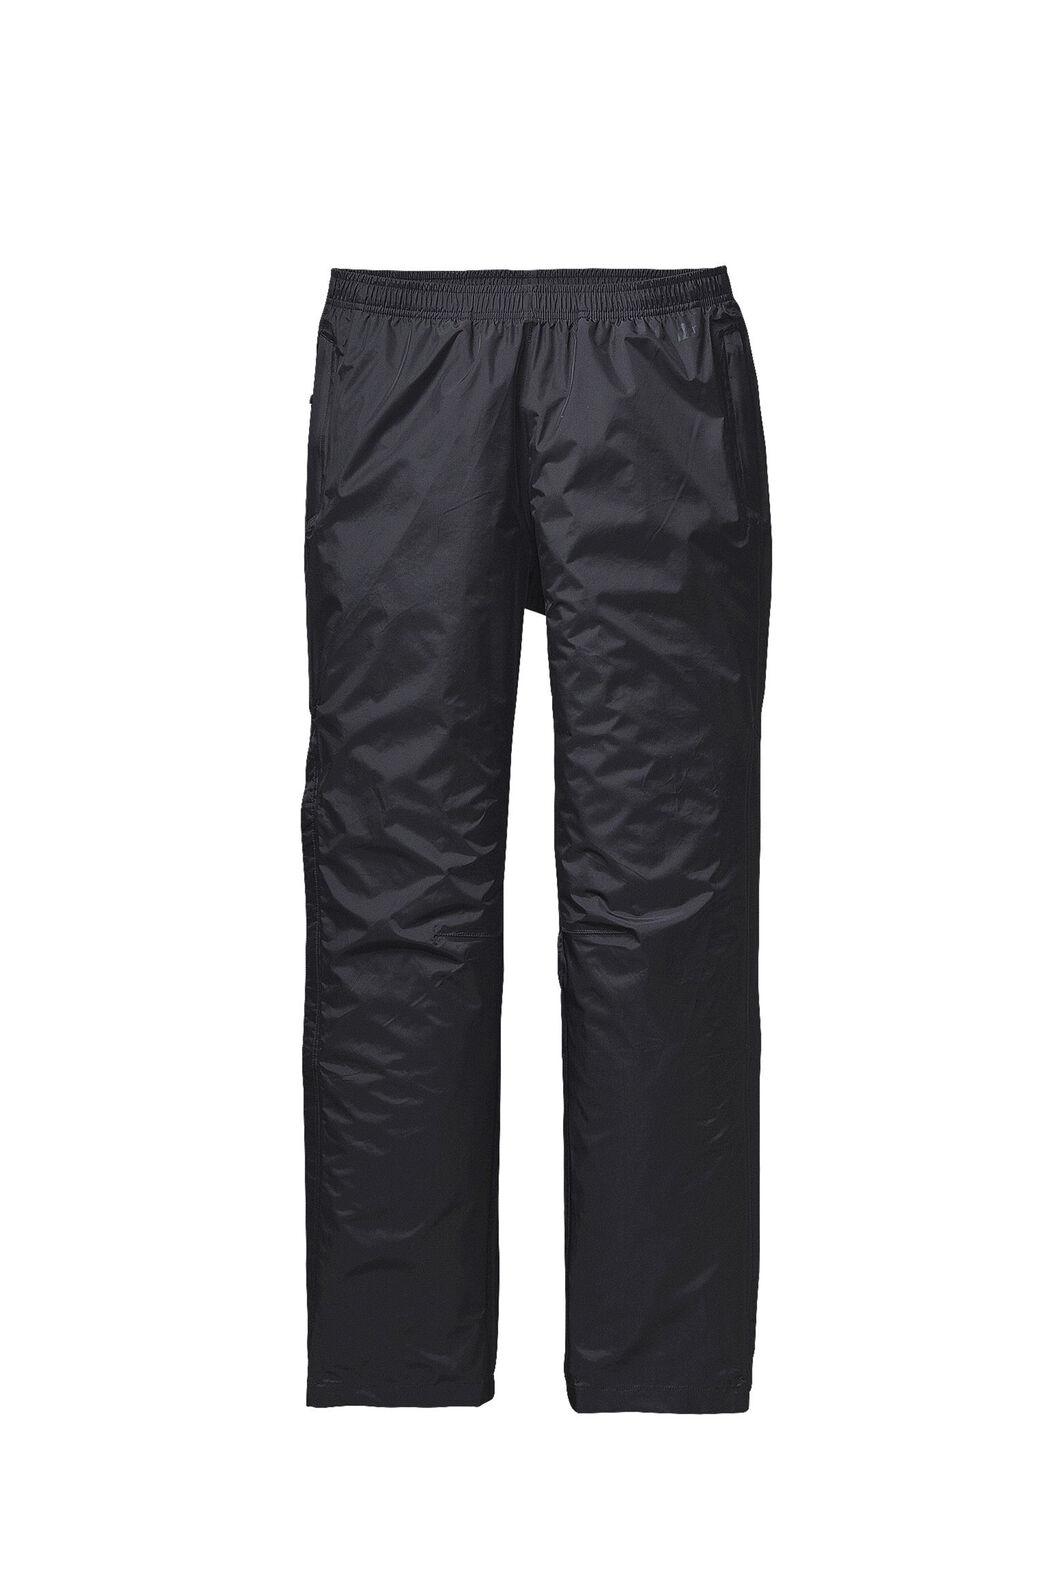 Patagonia Women's Torrentshell Pants, Black, hi-res